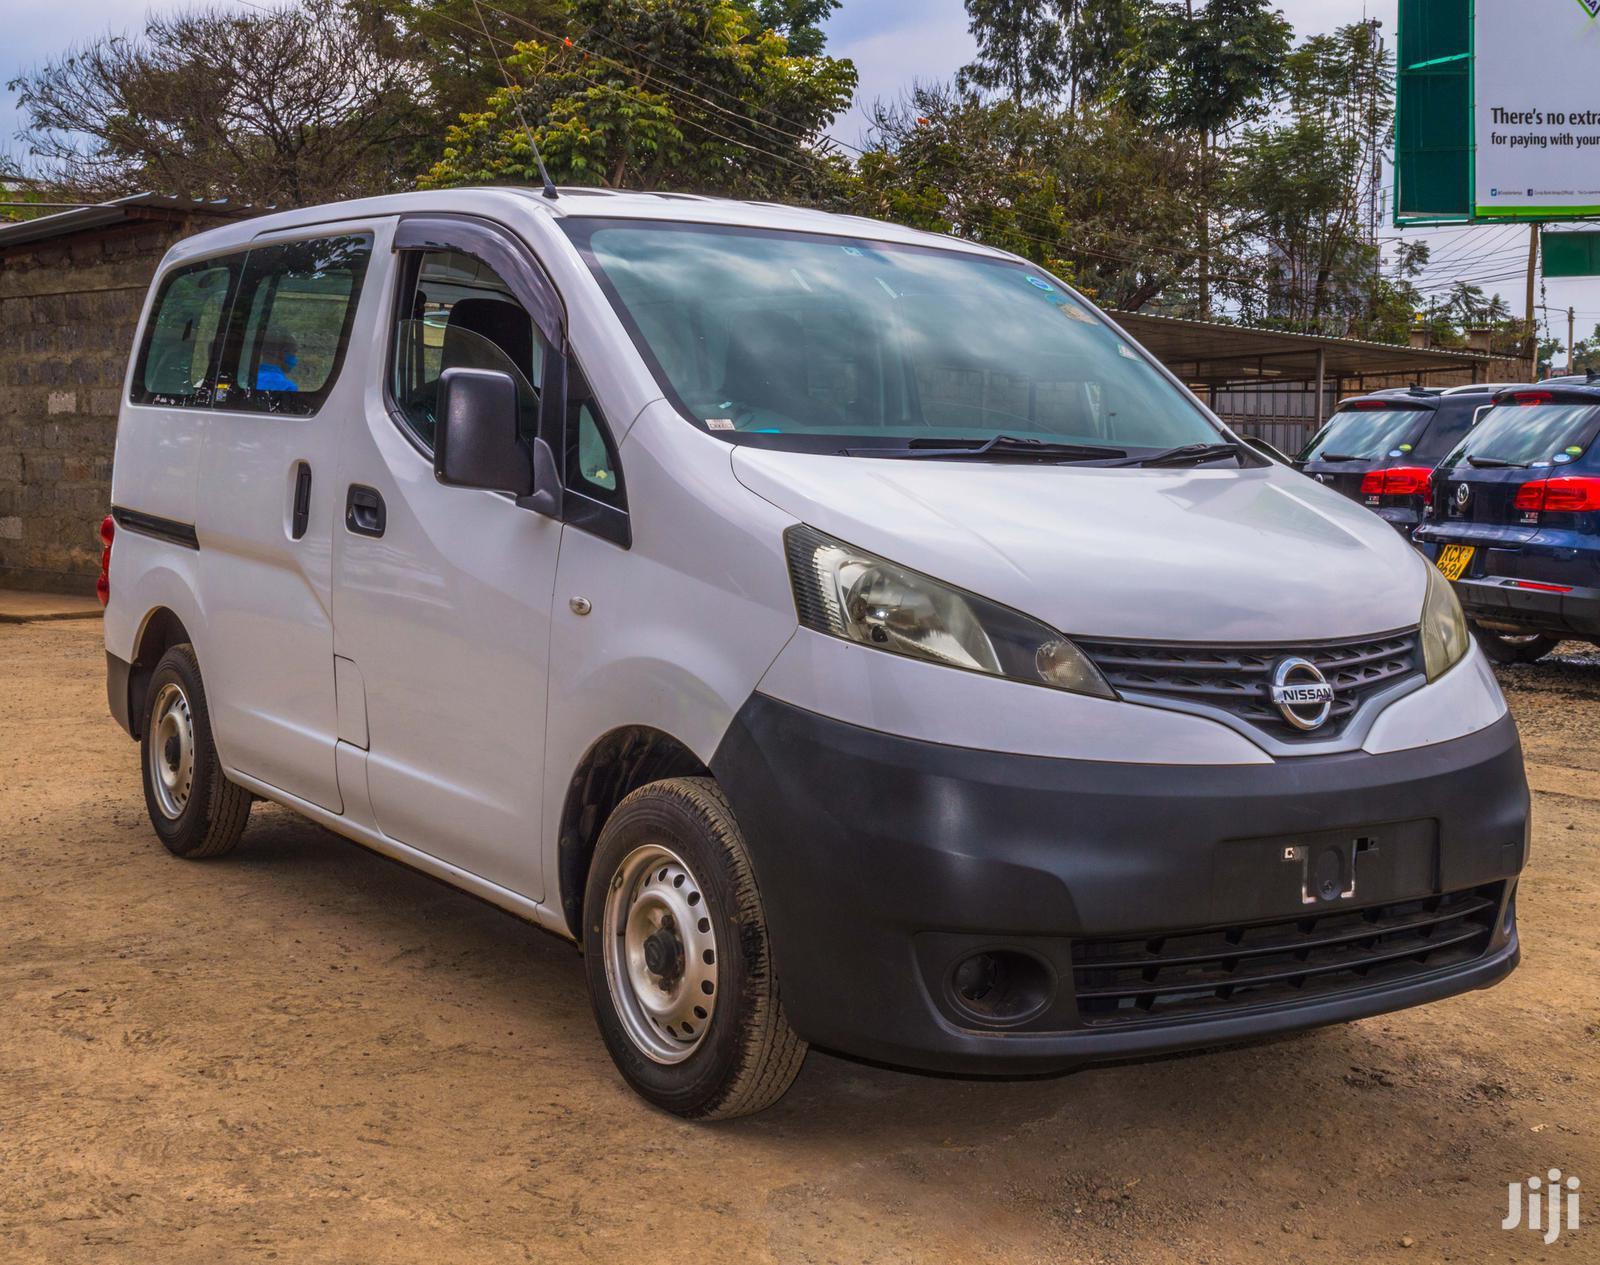 Nissan NV200 2012 White | Buses & Microbuses for sale in Township E, Kiambu, Kenya